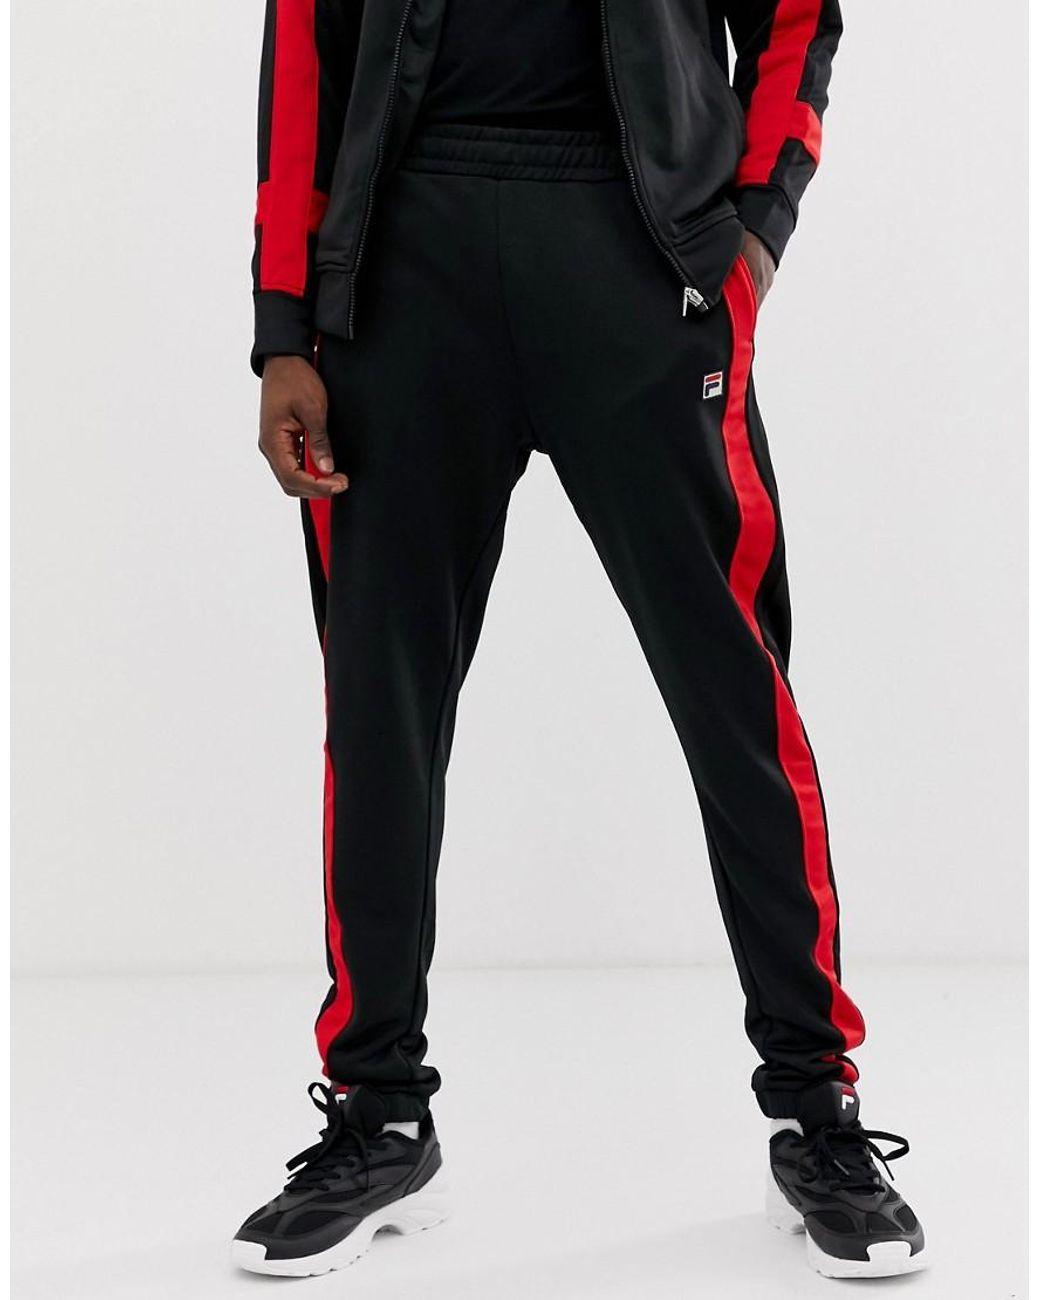 977117a3da5cf Fila Renzo Track jogger With Taping In Black in Black for Men - Lyst